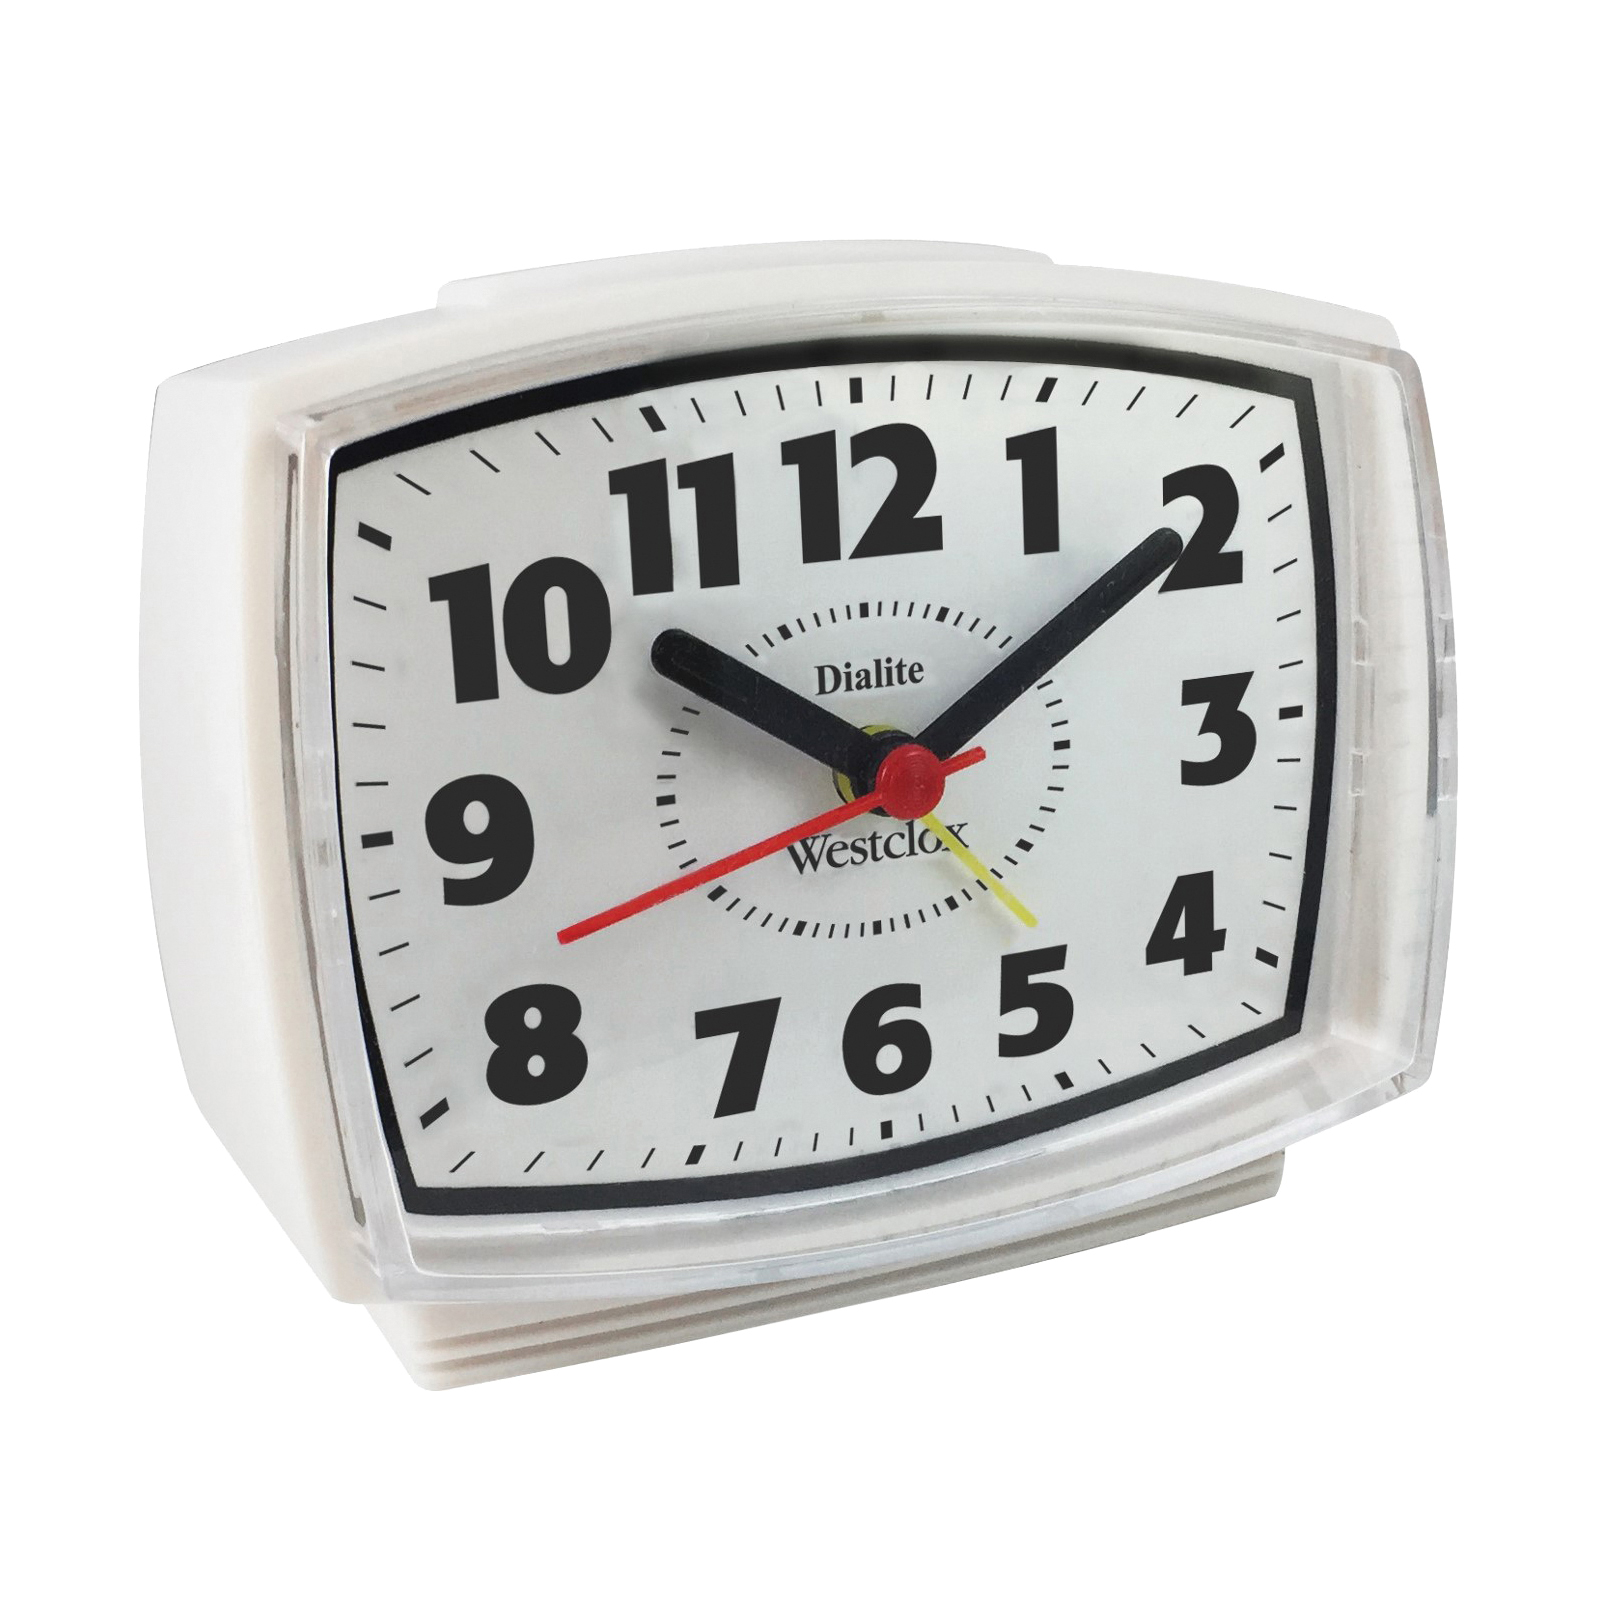 Picture of Westclox 22192A Alarm Clock, White Case